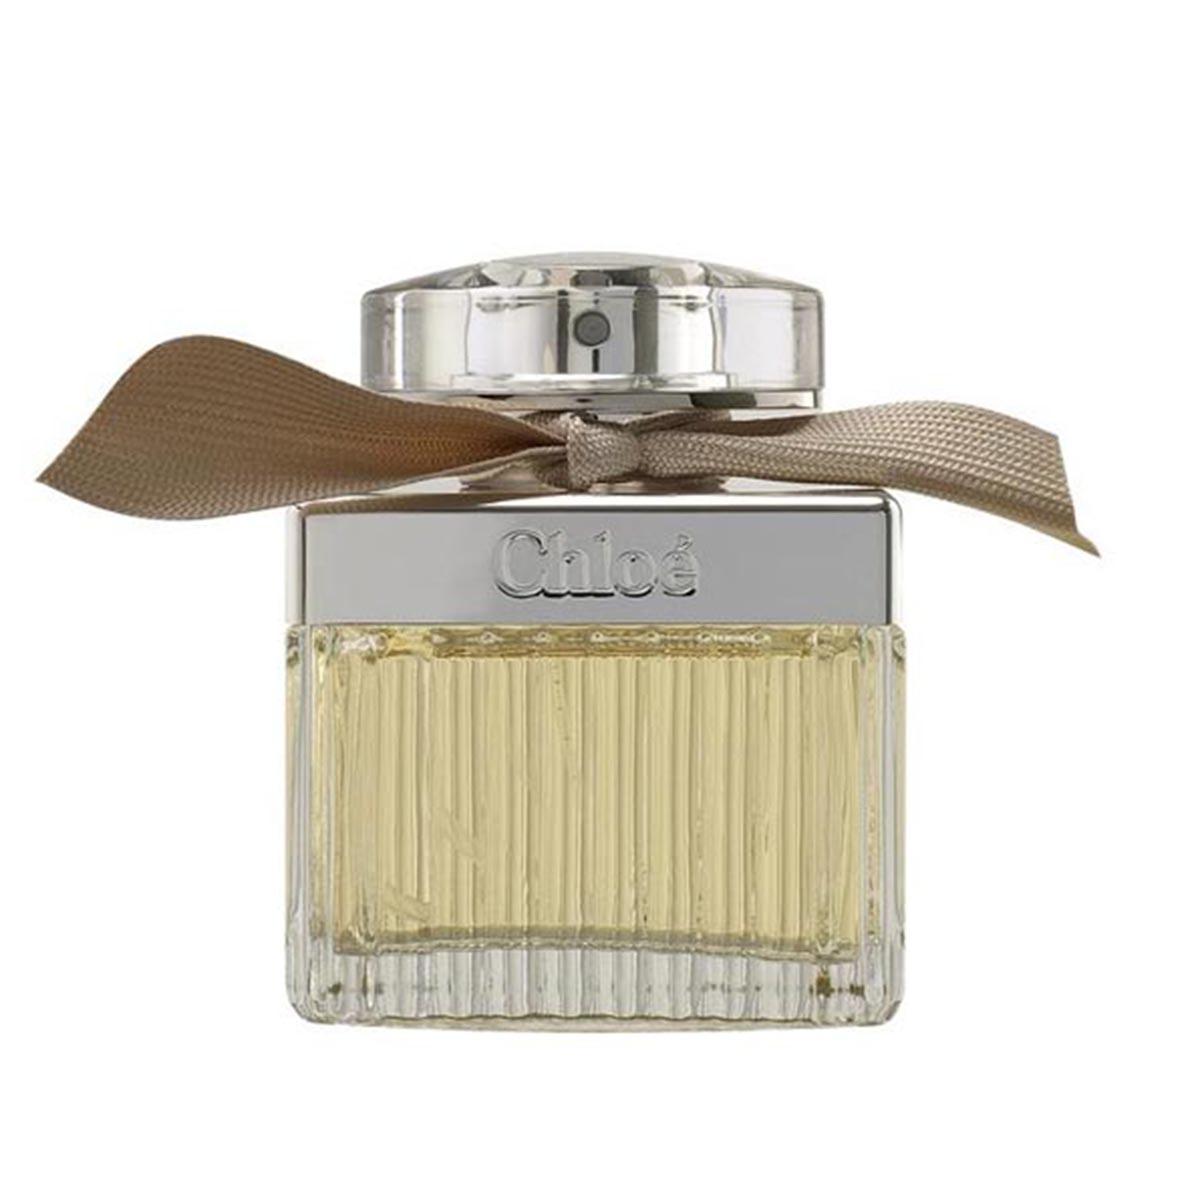 Chloe eau de parfum 30ml vaporizador